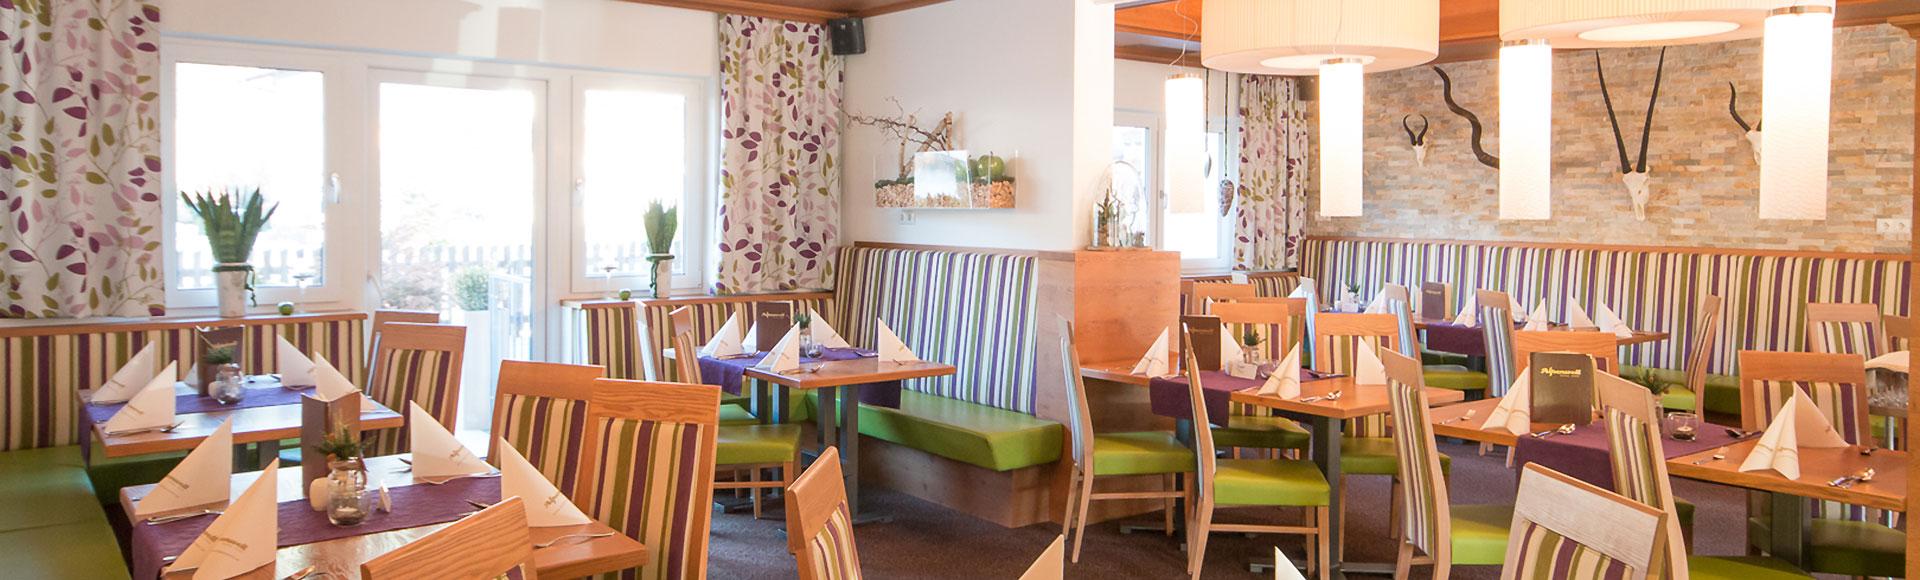 Restaurant Hotel Flachau Alpenwelt 1